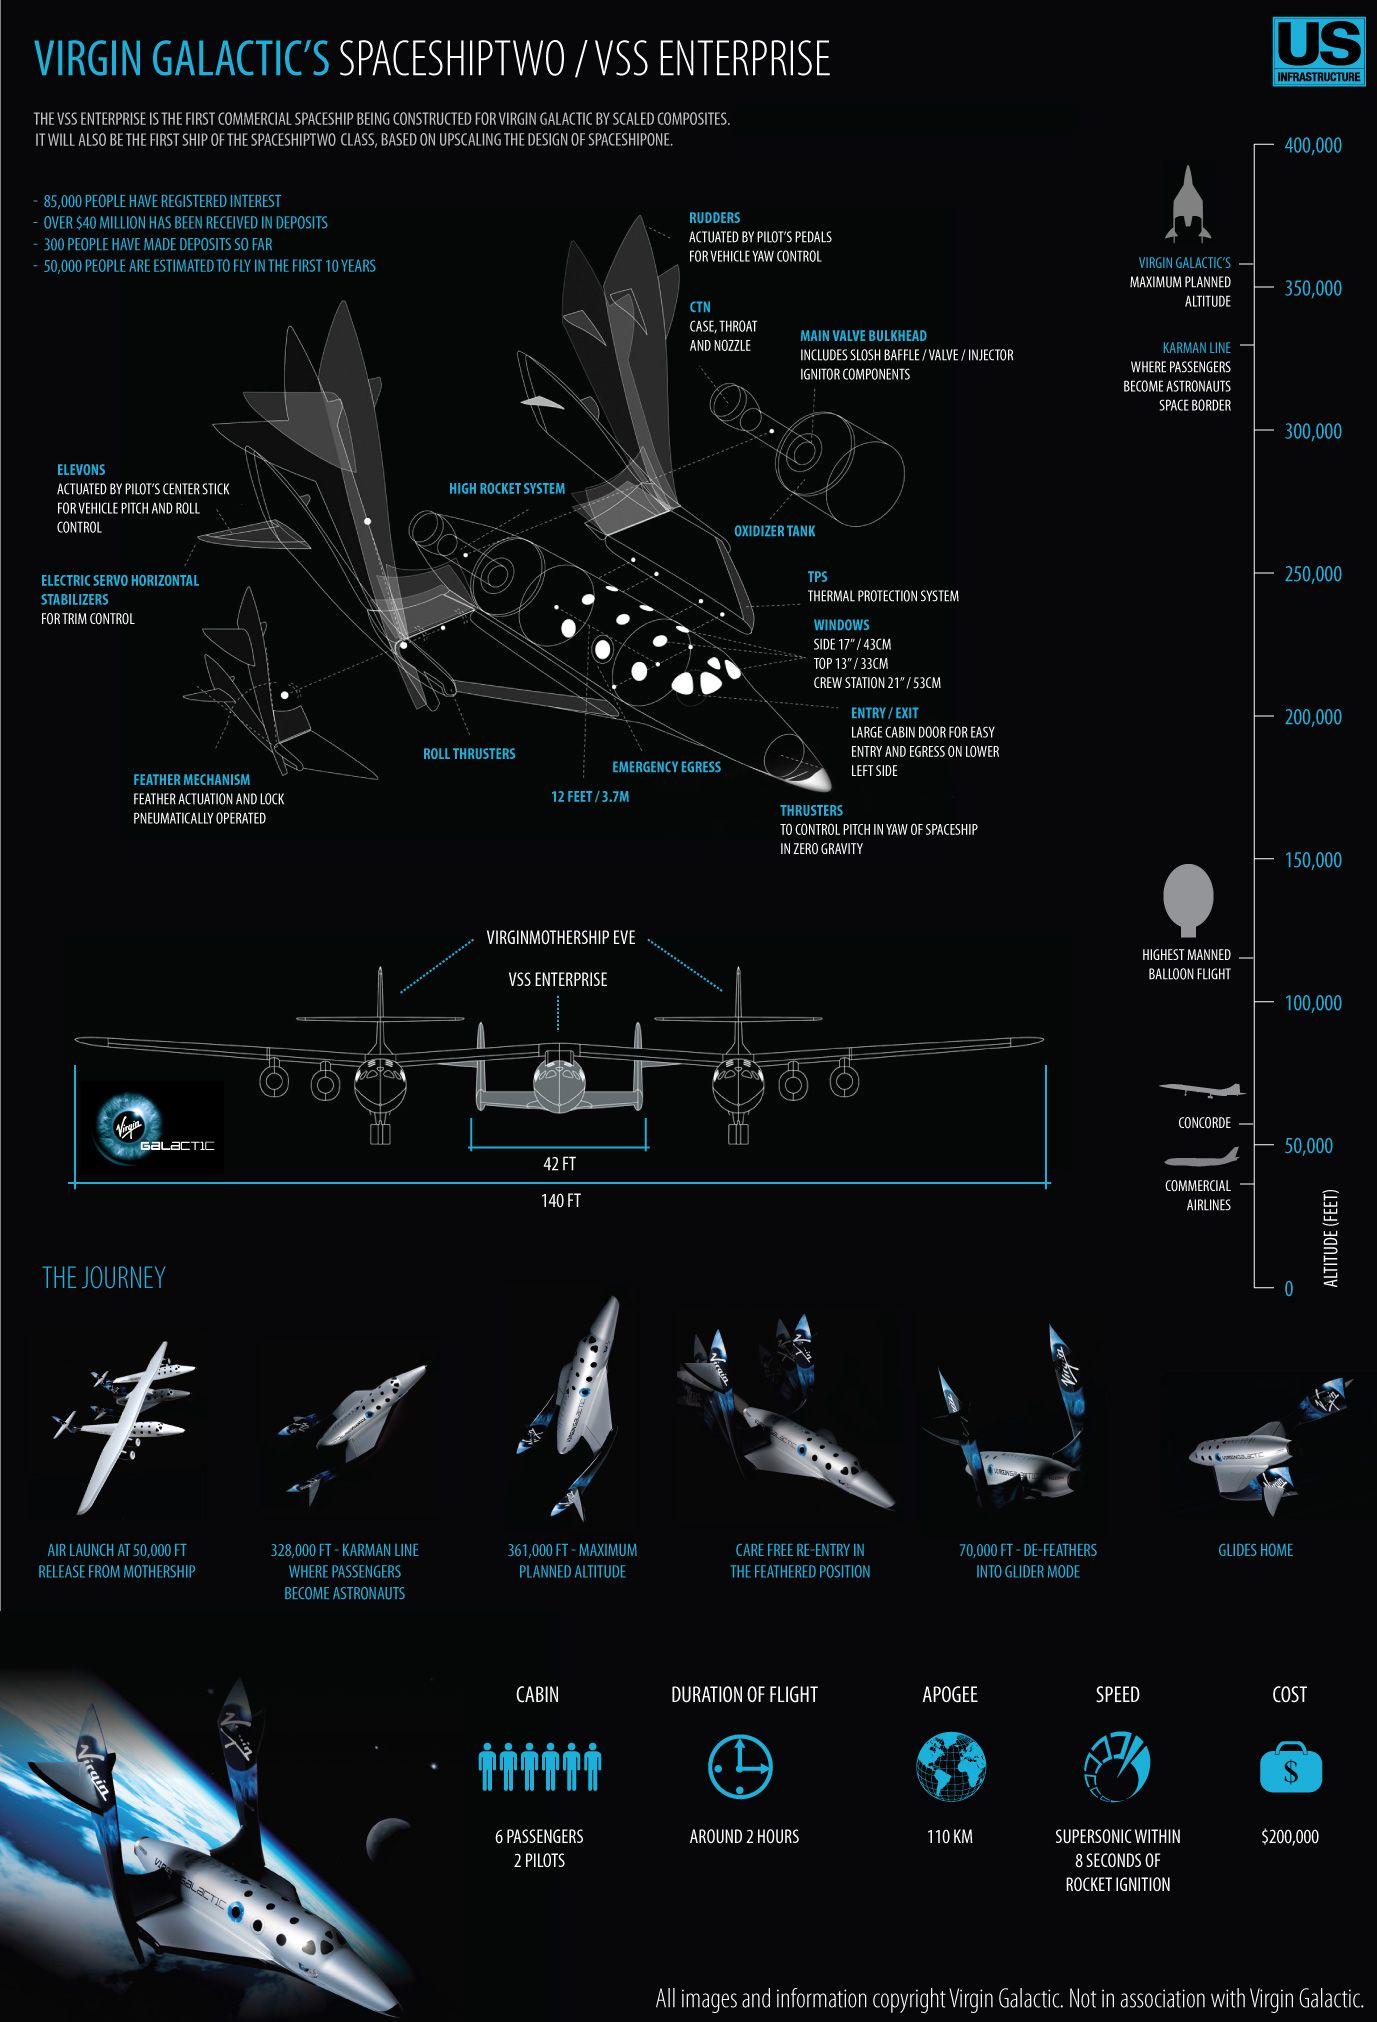 Virgin Galactics Spaceship Two